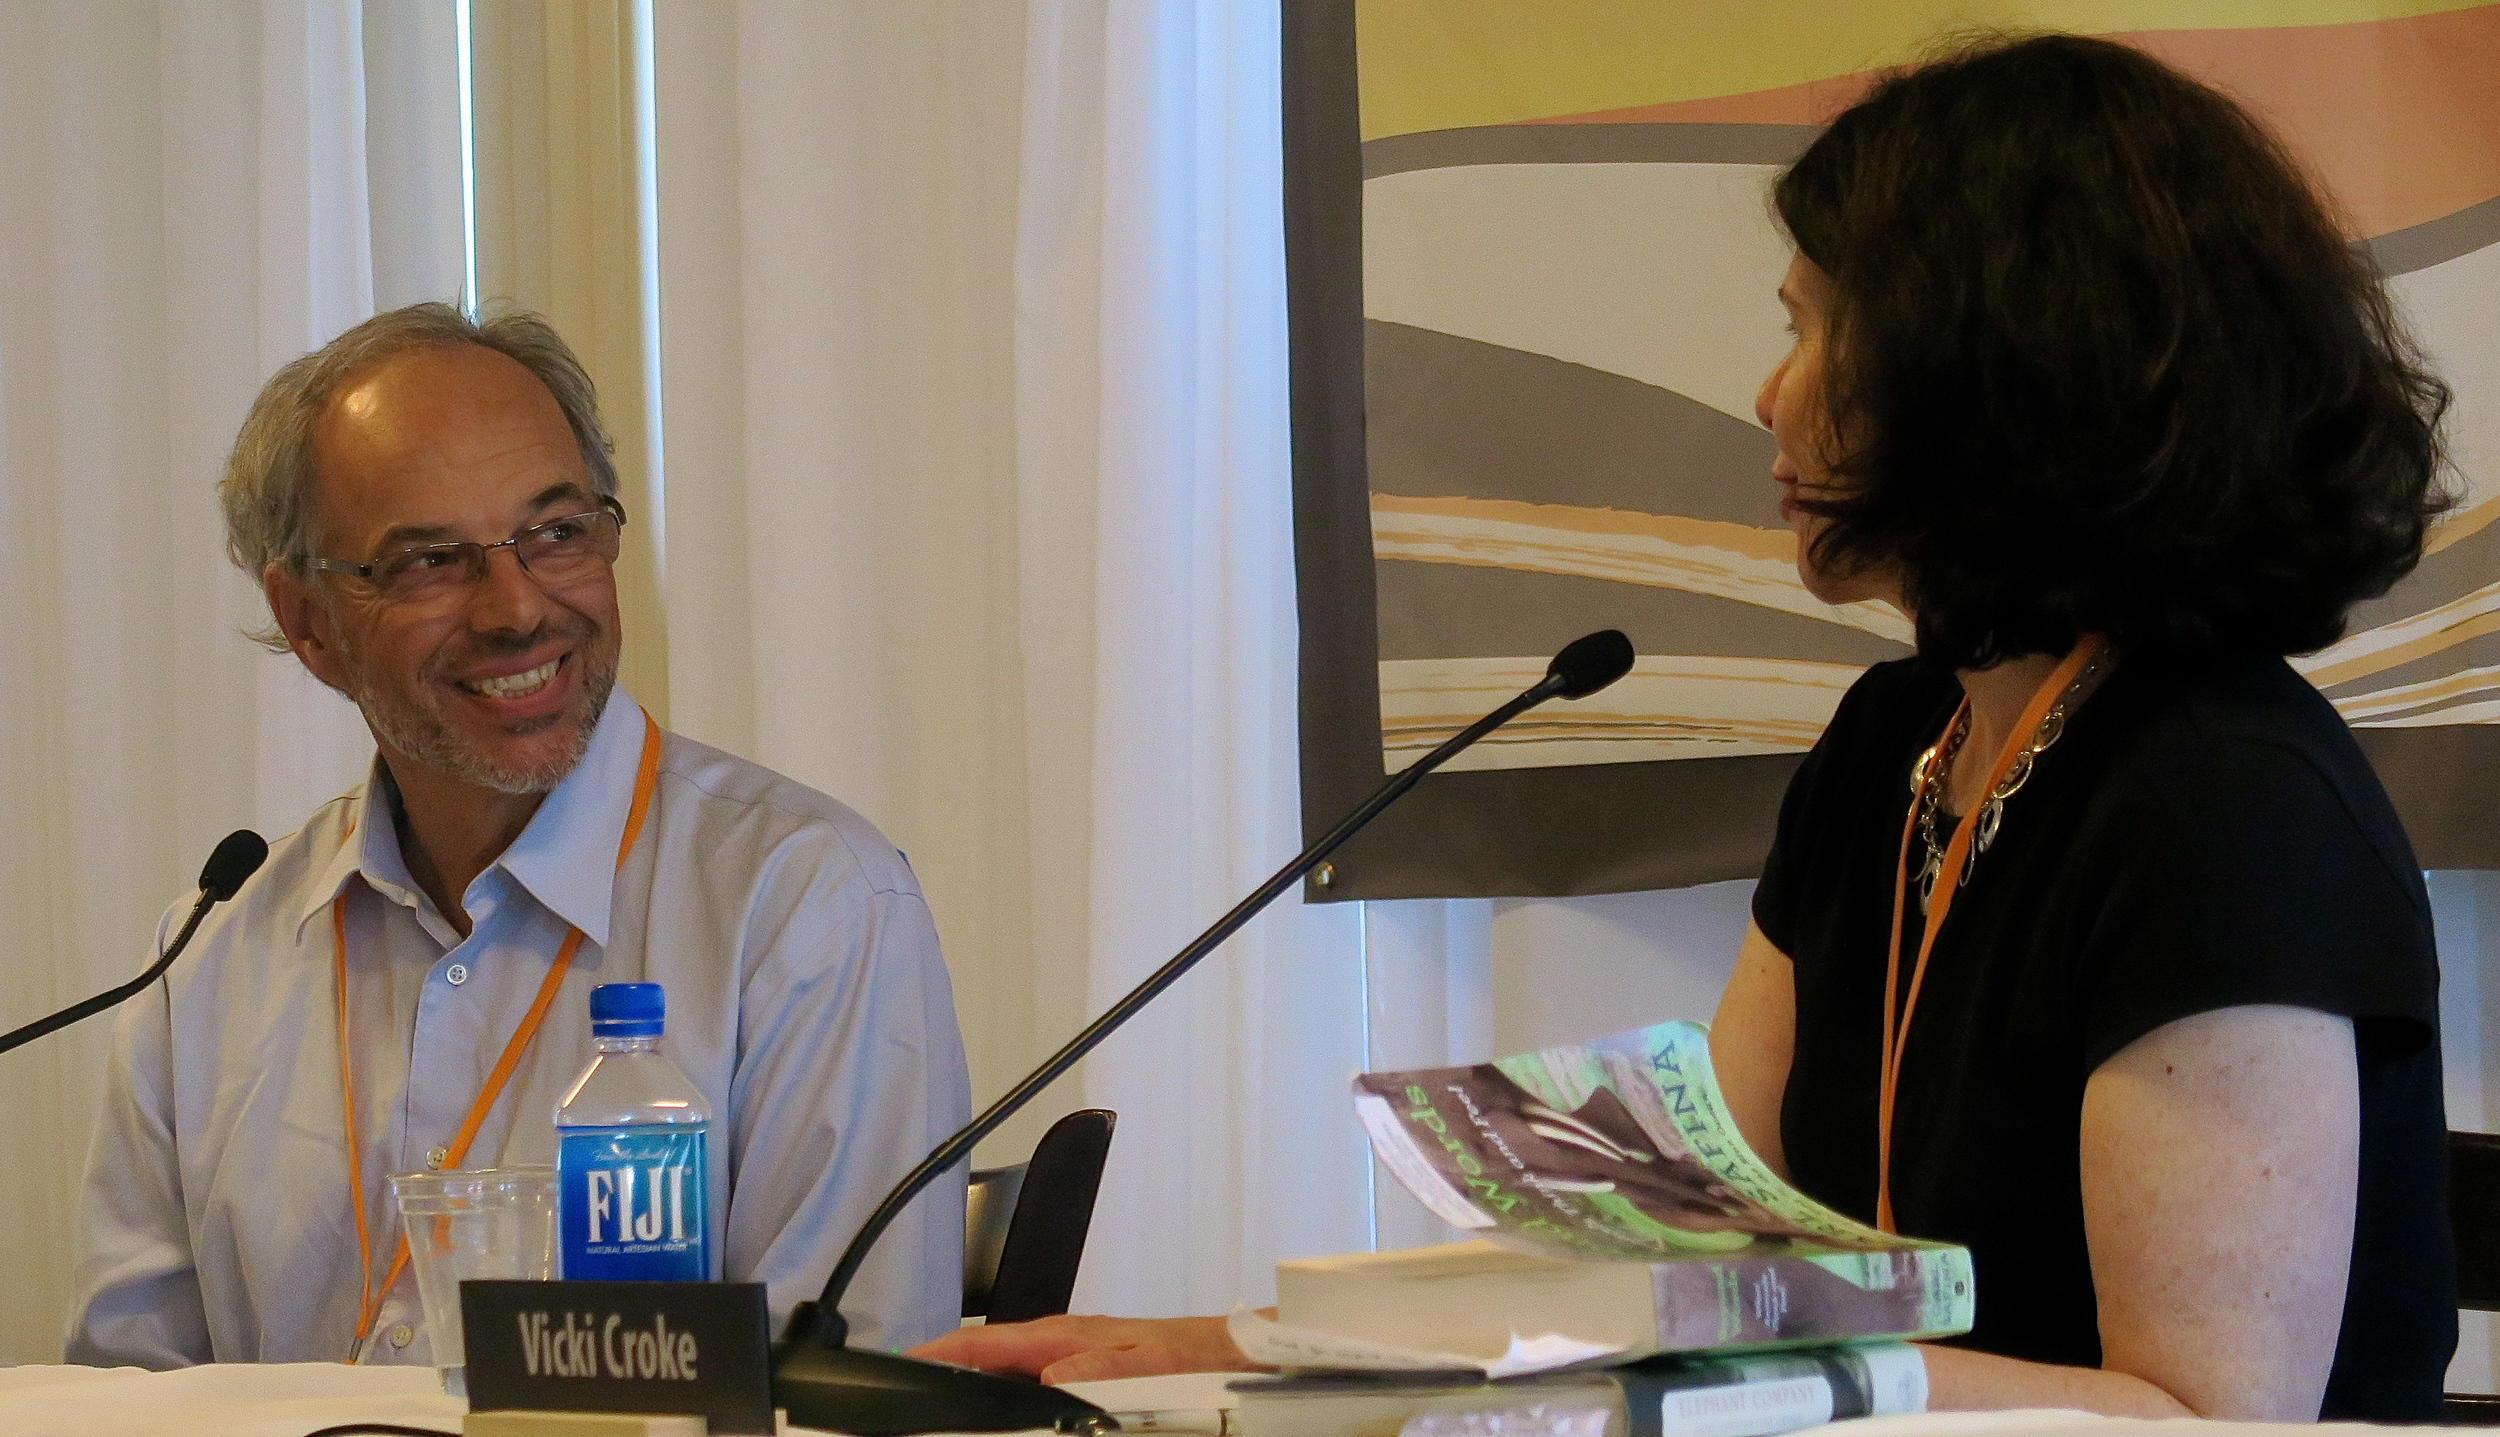 Carl Safina and Vicki Croke